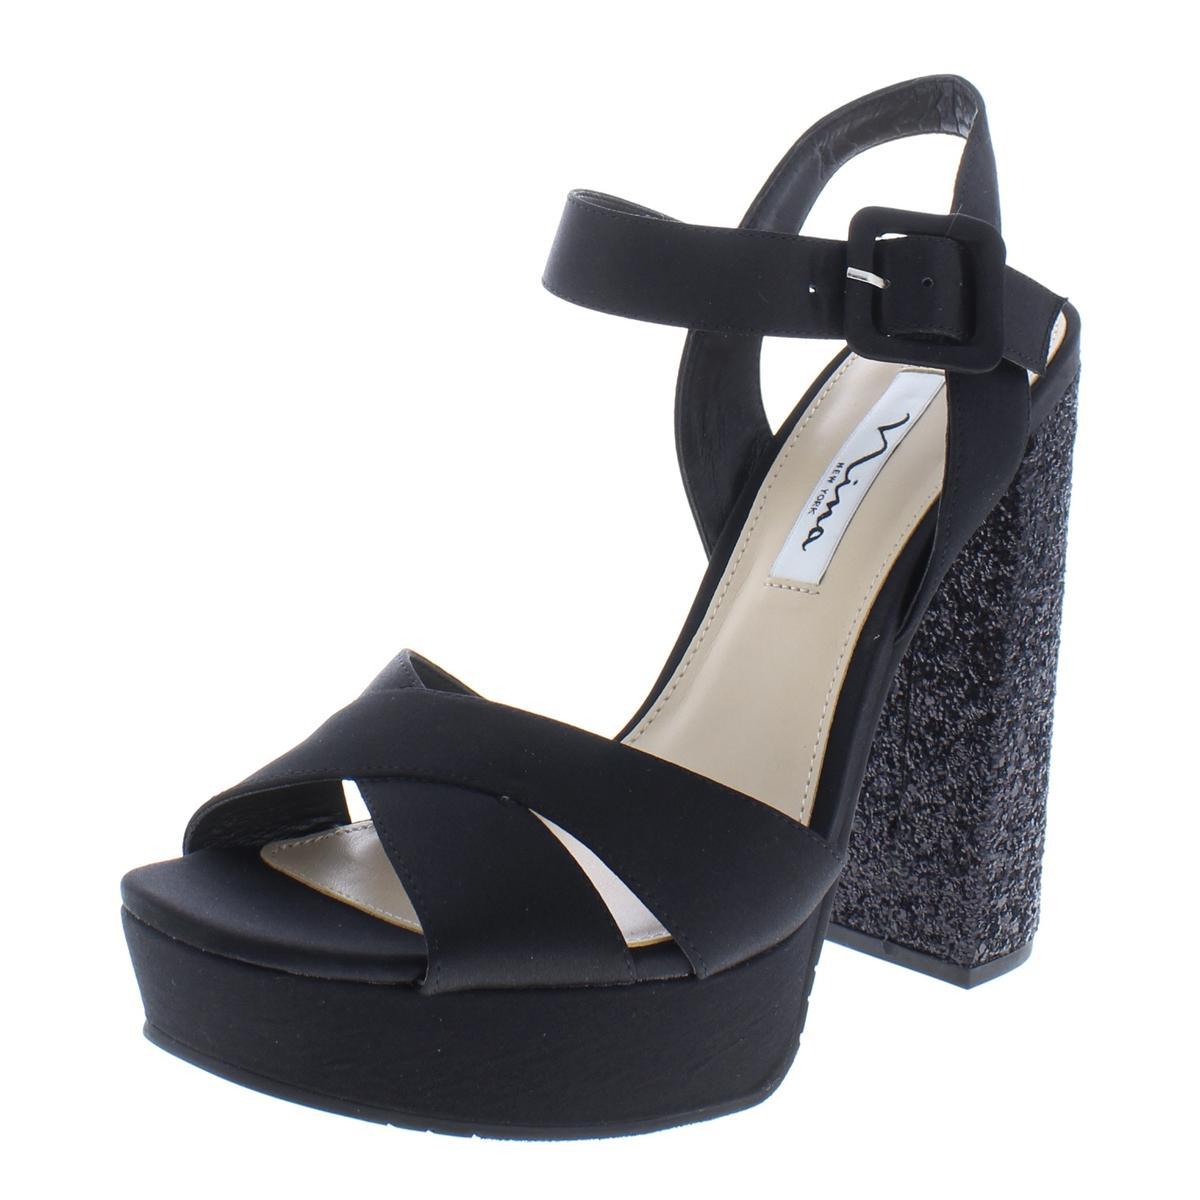 96ac020f10fd Details about Nina Womens Savita Black Satin Platform Sandals Shoes 11  Medium (B